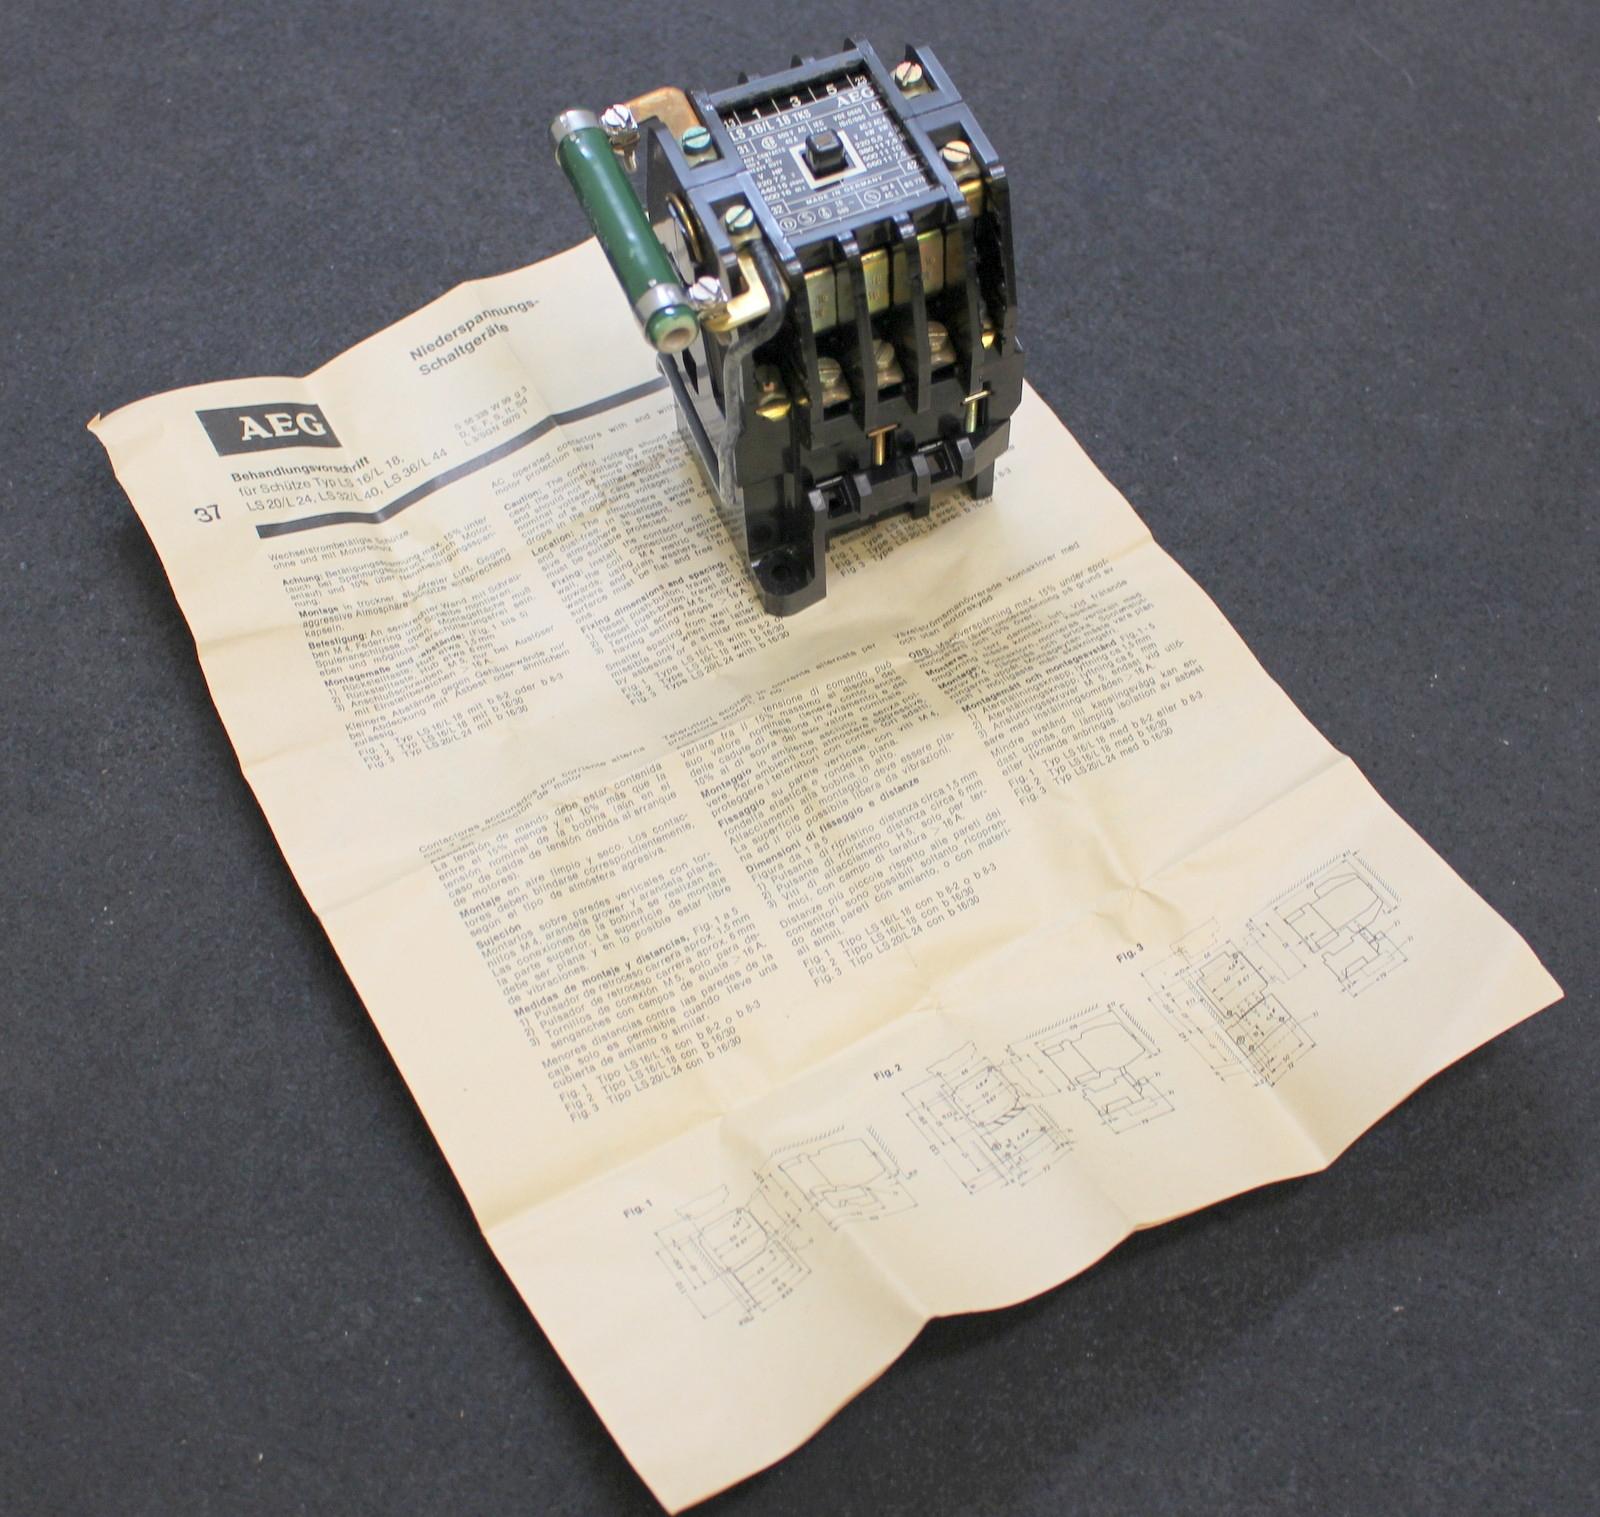 ungeschirmt 6p6c 6p6c ISDN-t-adaptador enchufe rj12 a 2xrj12-enchufe hembra